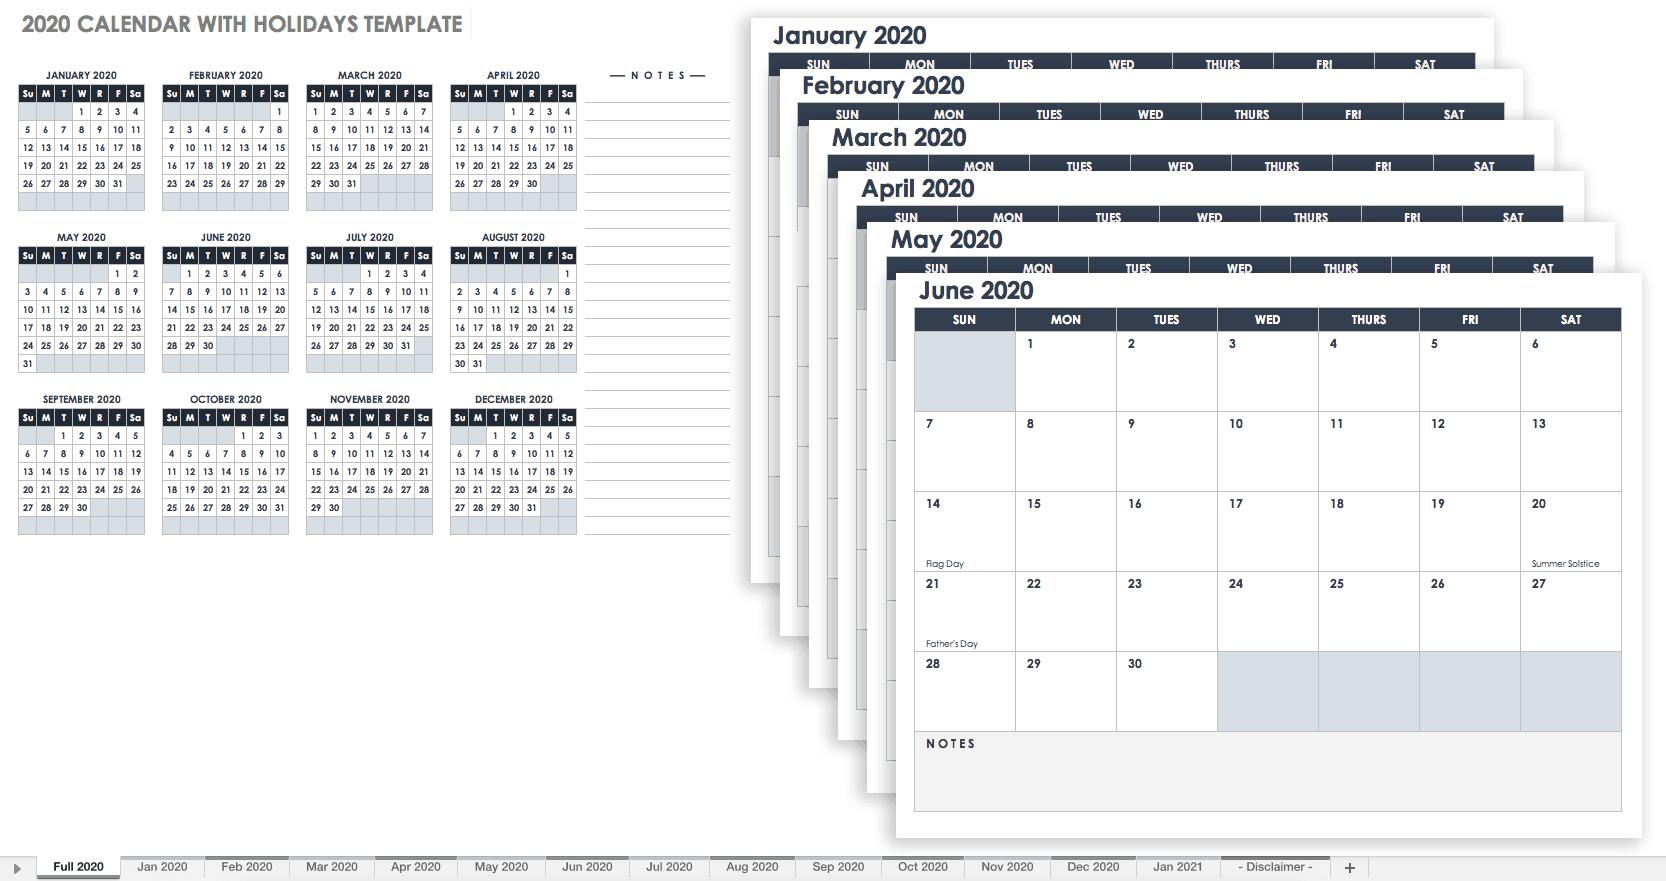 Free Google Calendar Templates | Smartsheet within Calendar Template Google Docs Spreadsheet